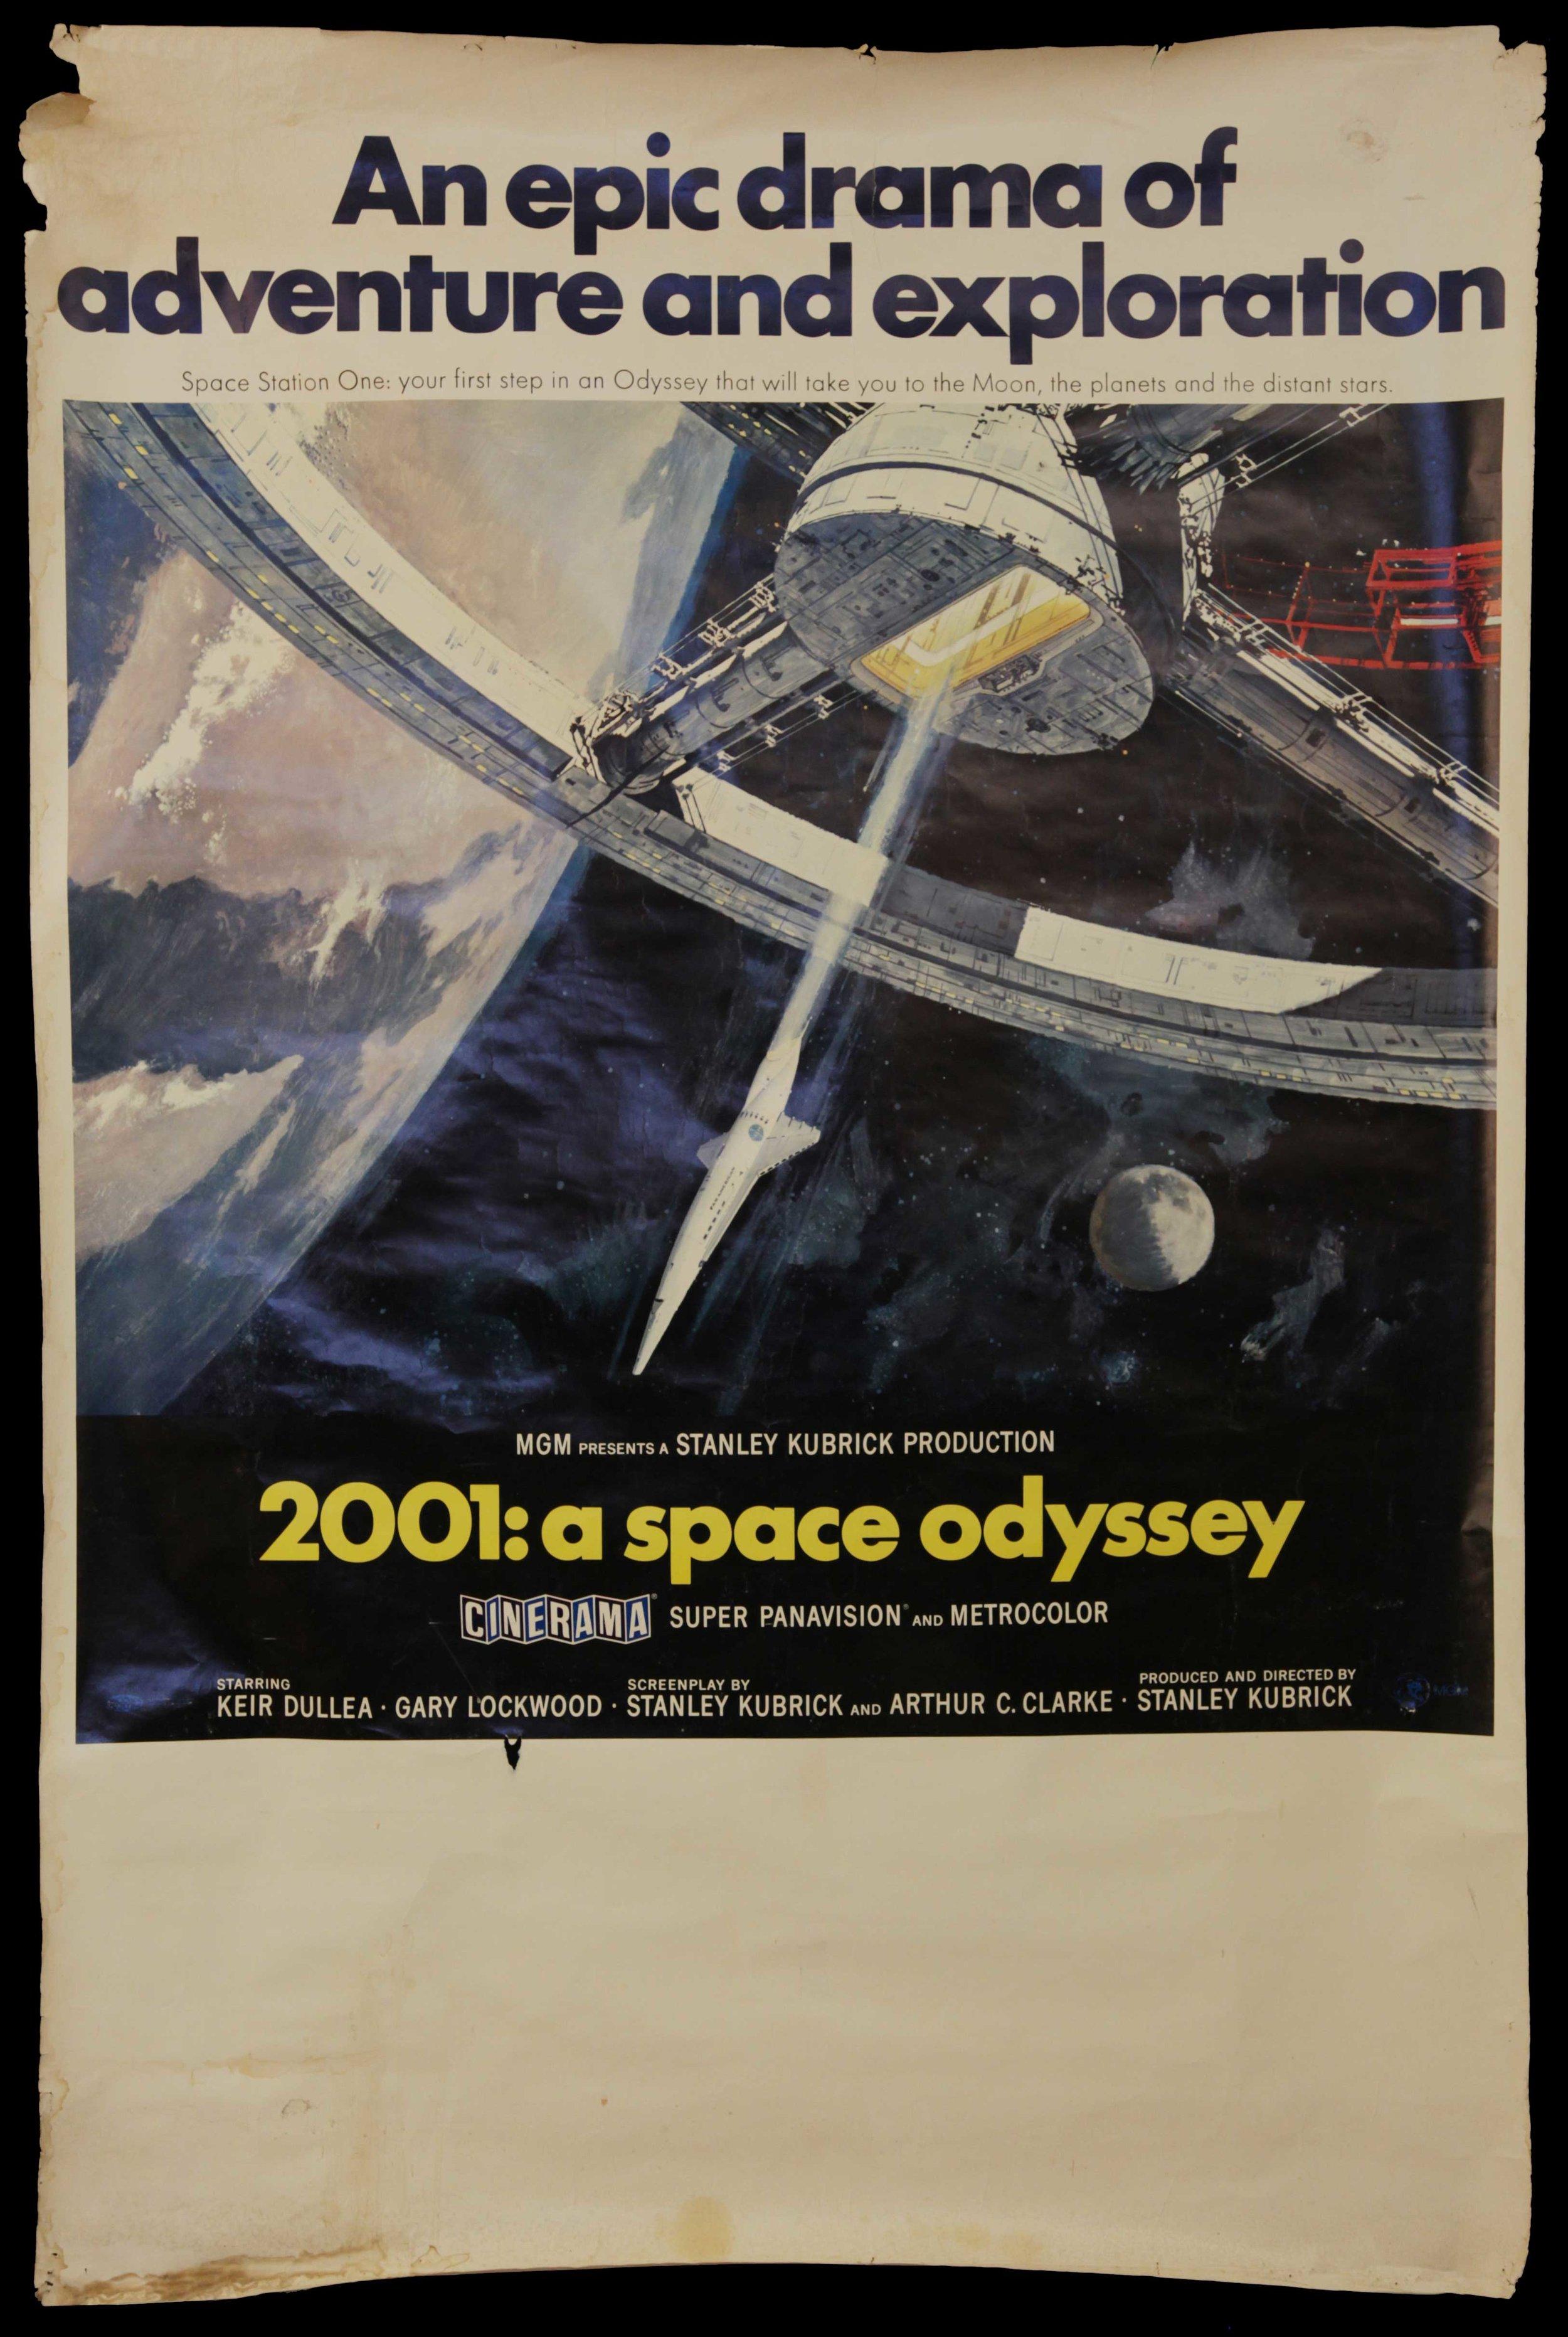 2001 A Space Odyssey (1968)